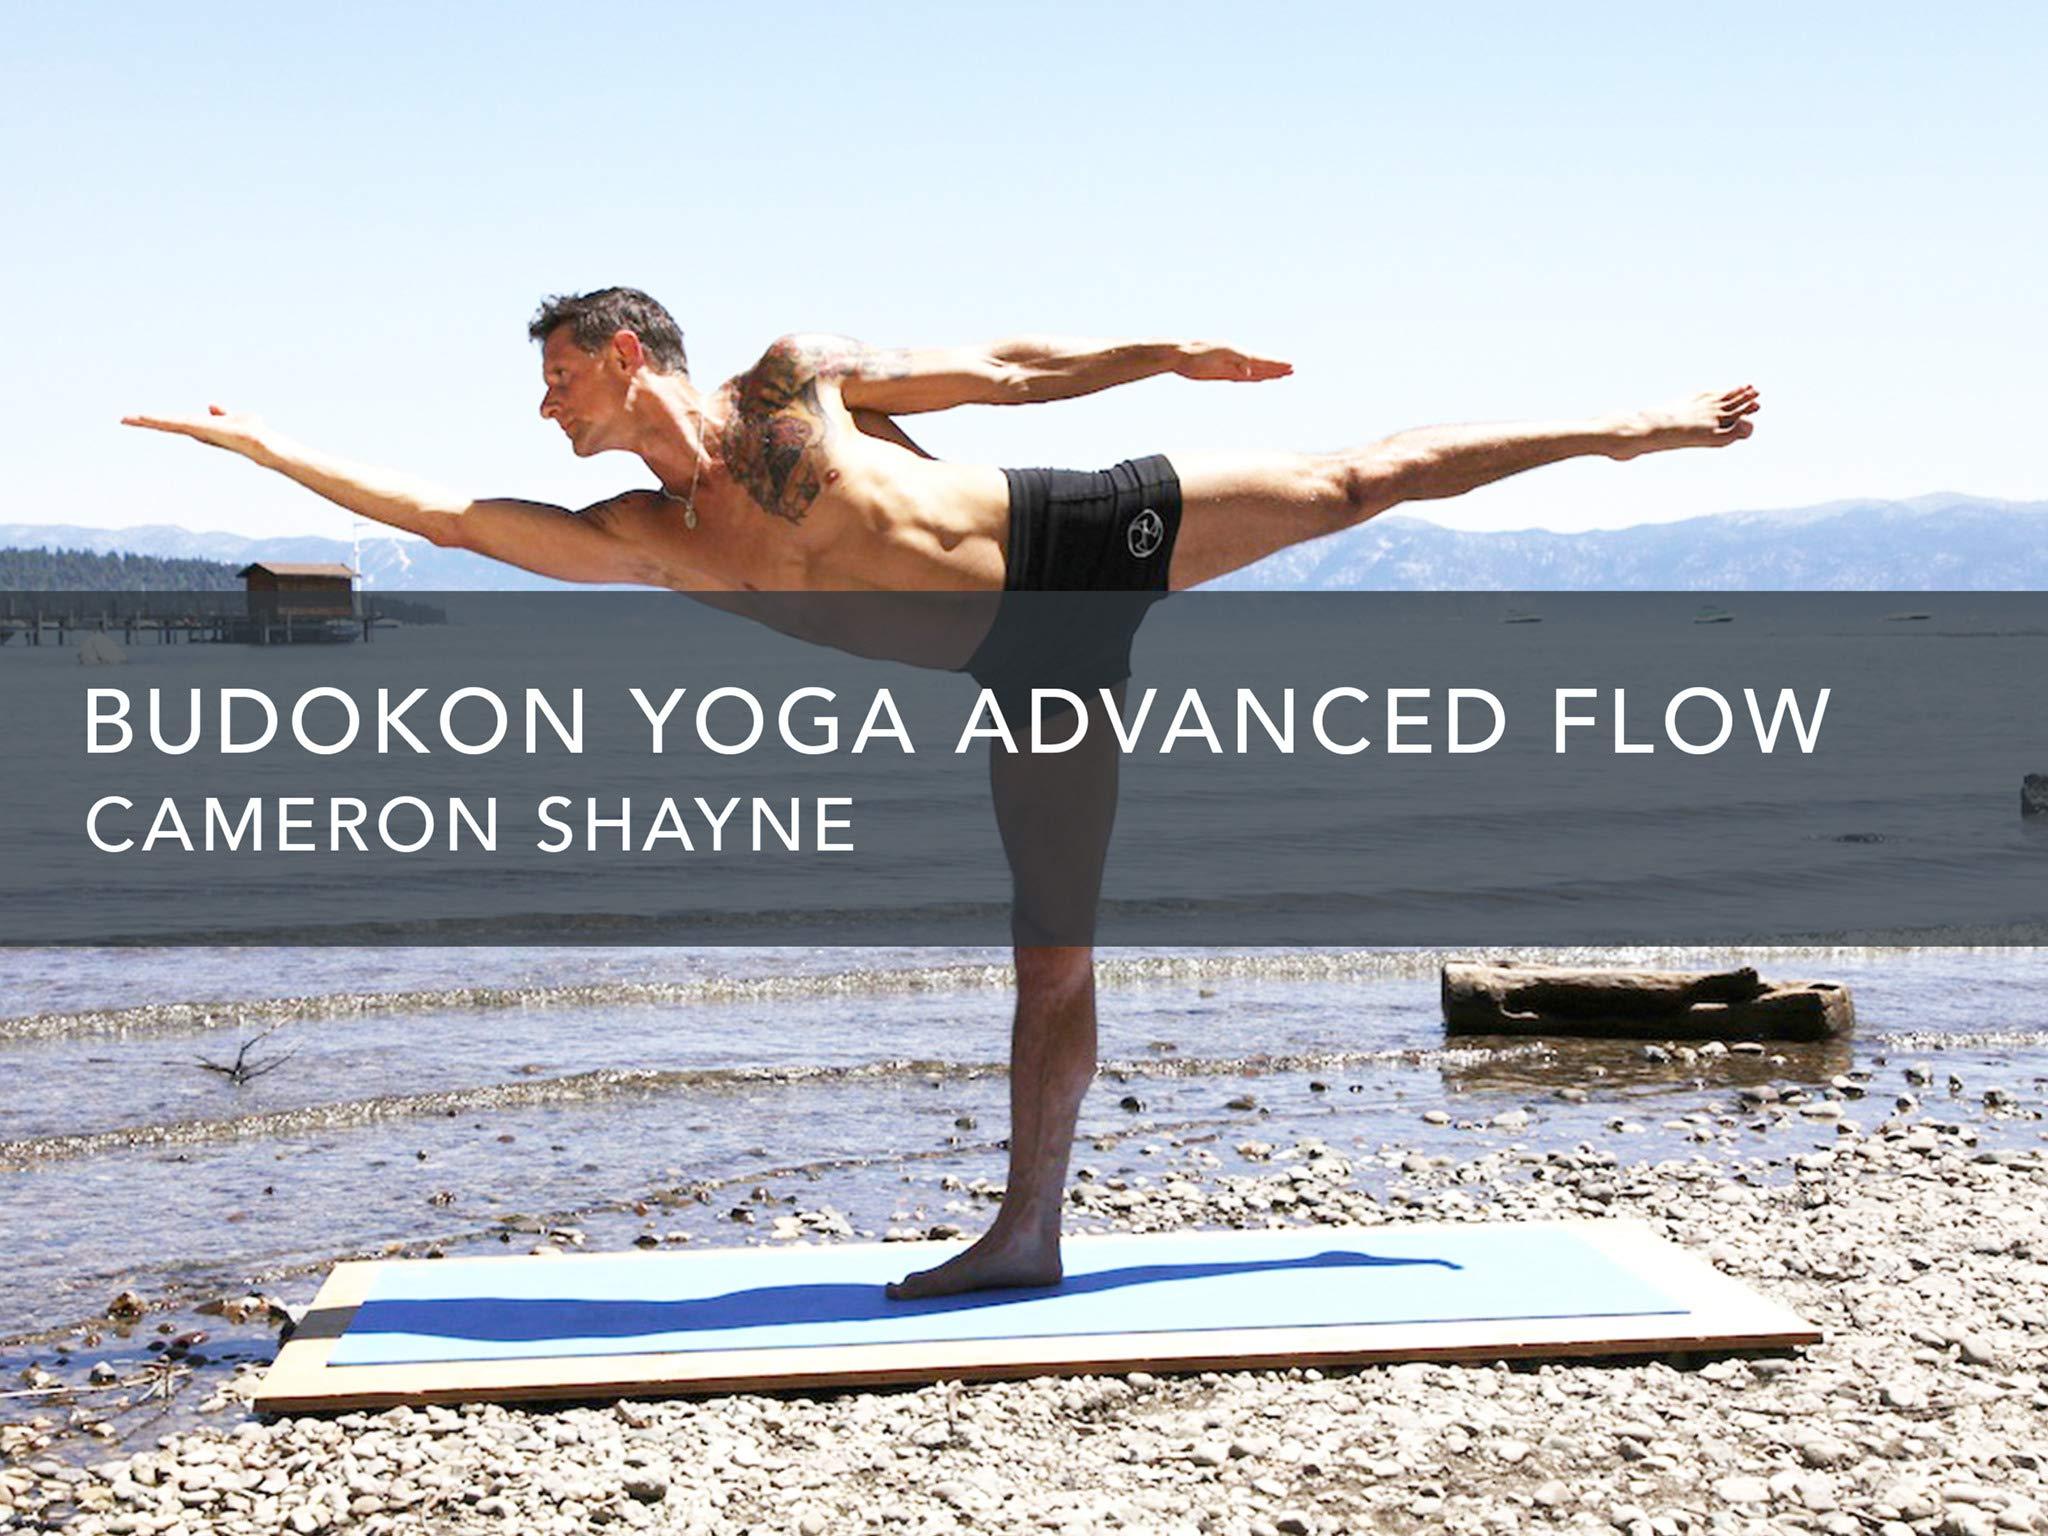 Amazon.com: Budokon Yoga Advanced Flow: Cameron Shayne, Gaia